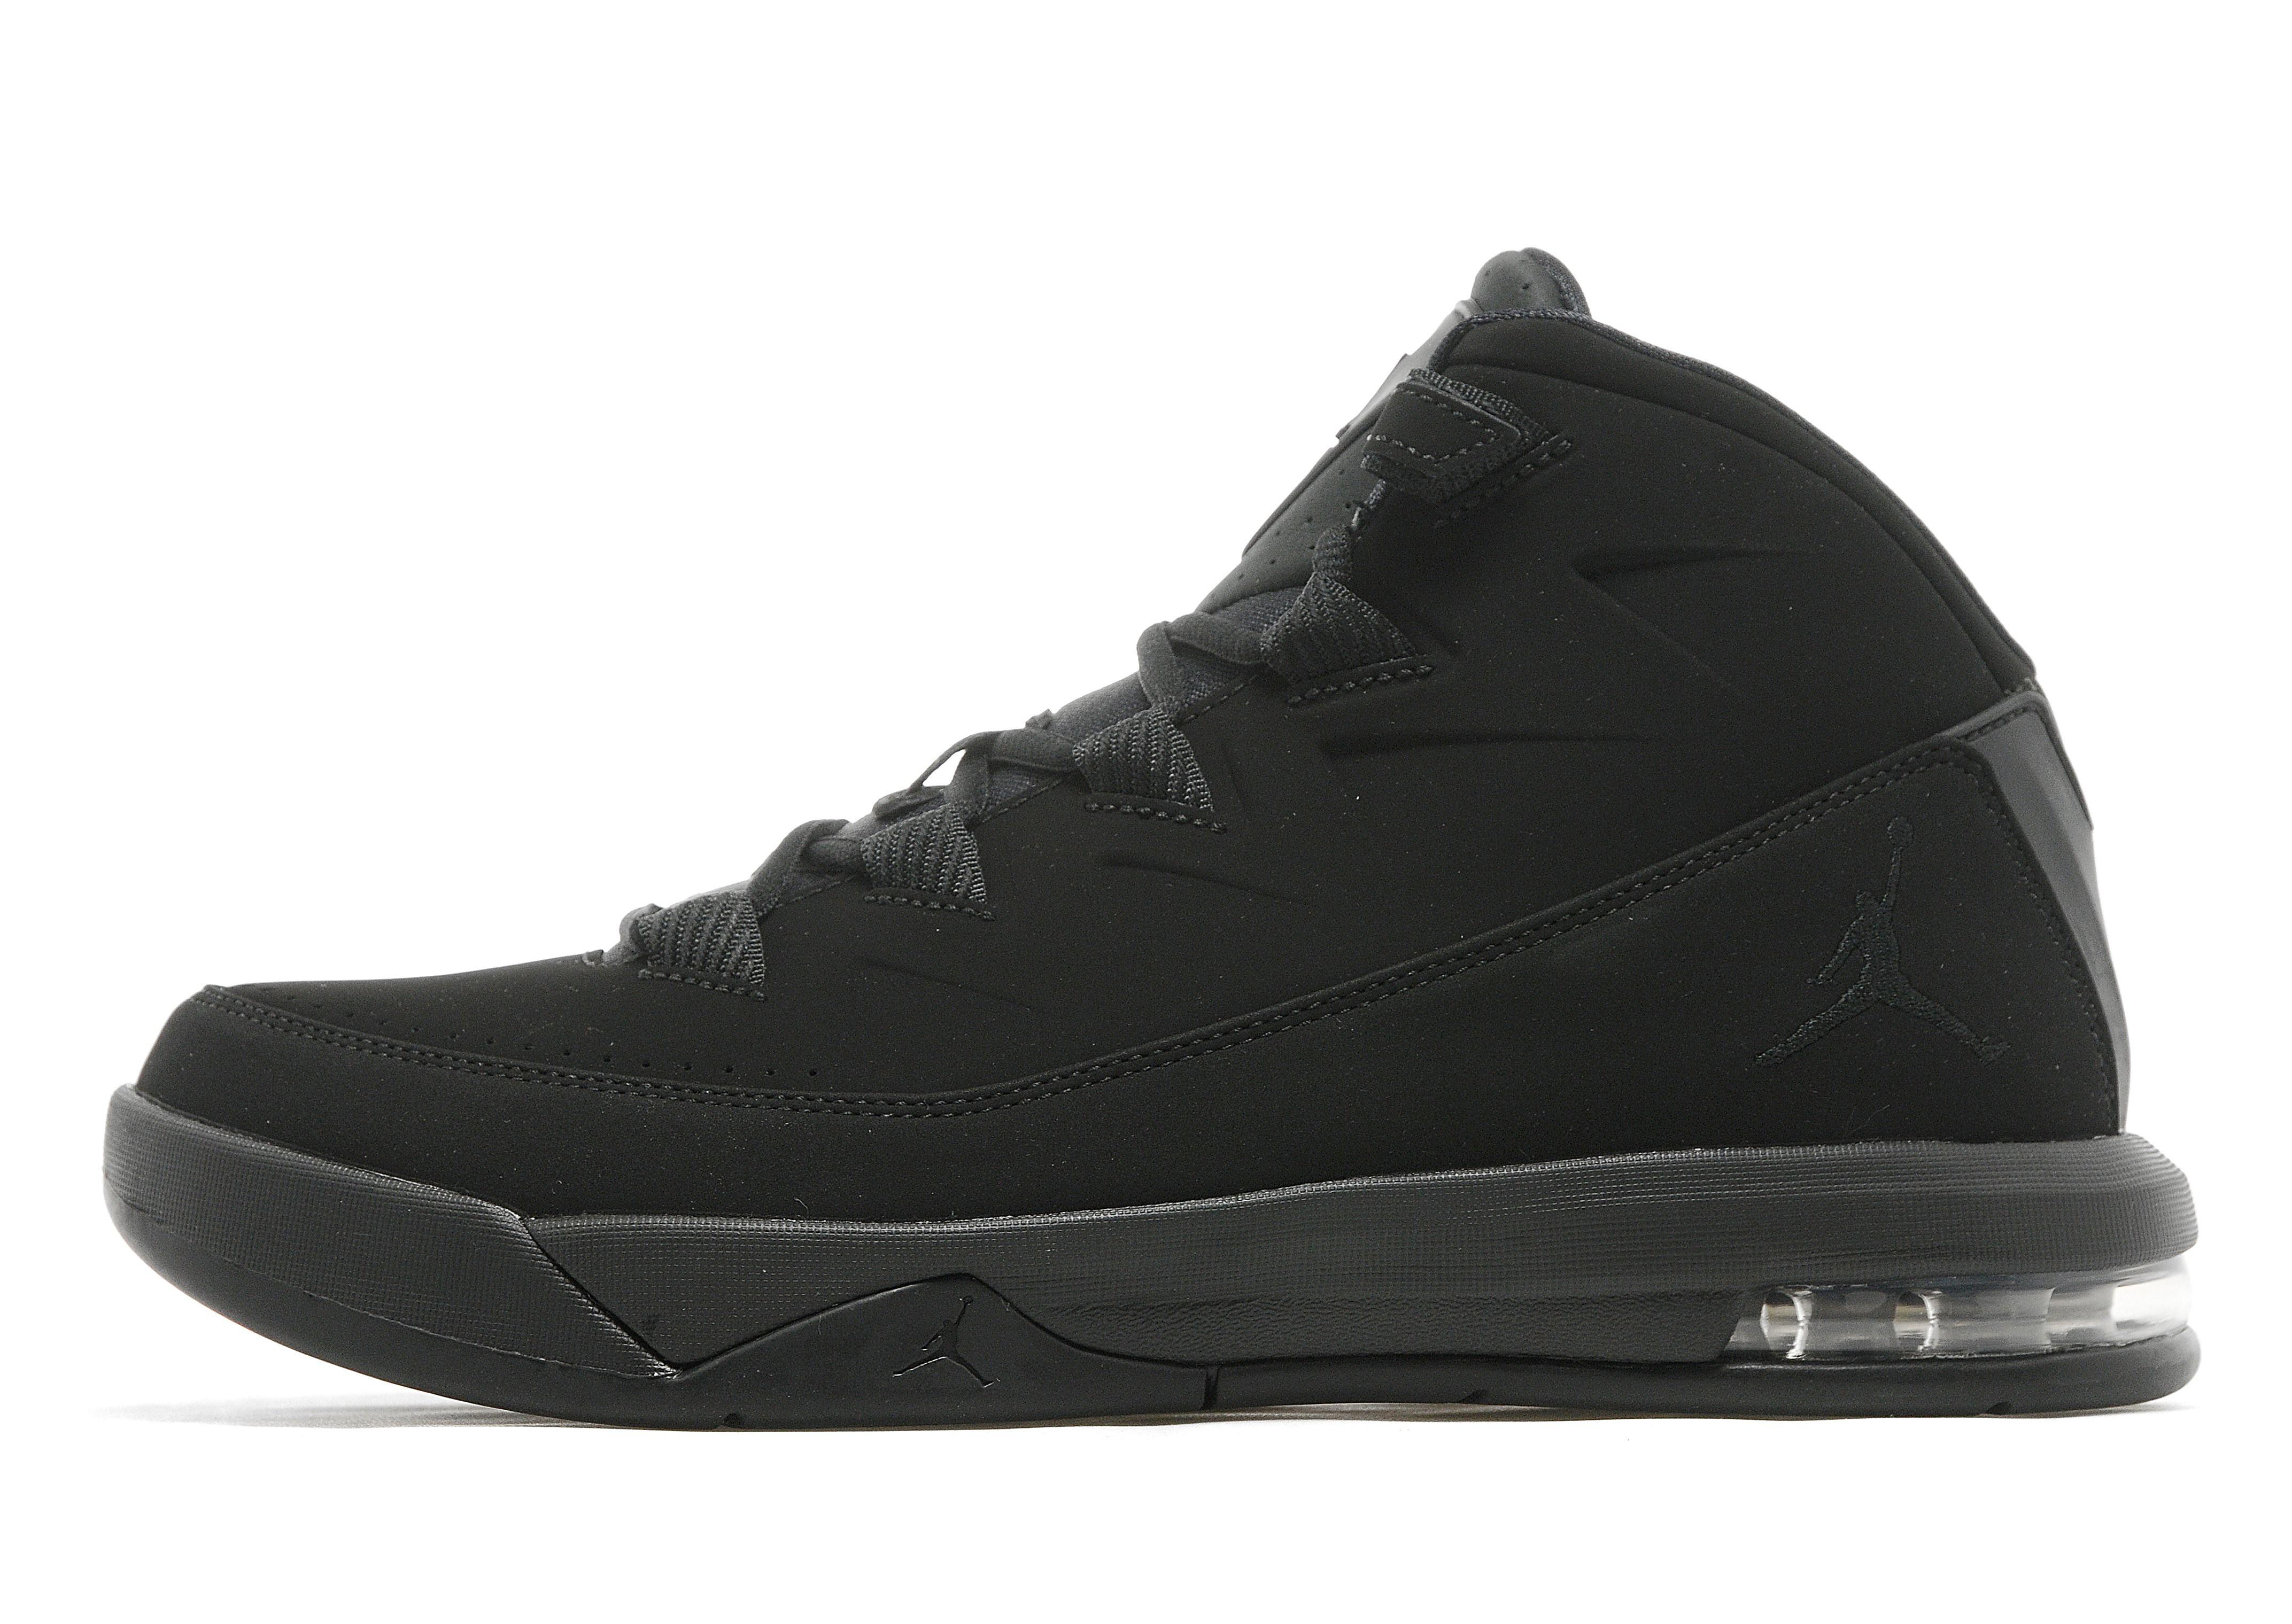 Jordan Deluxe